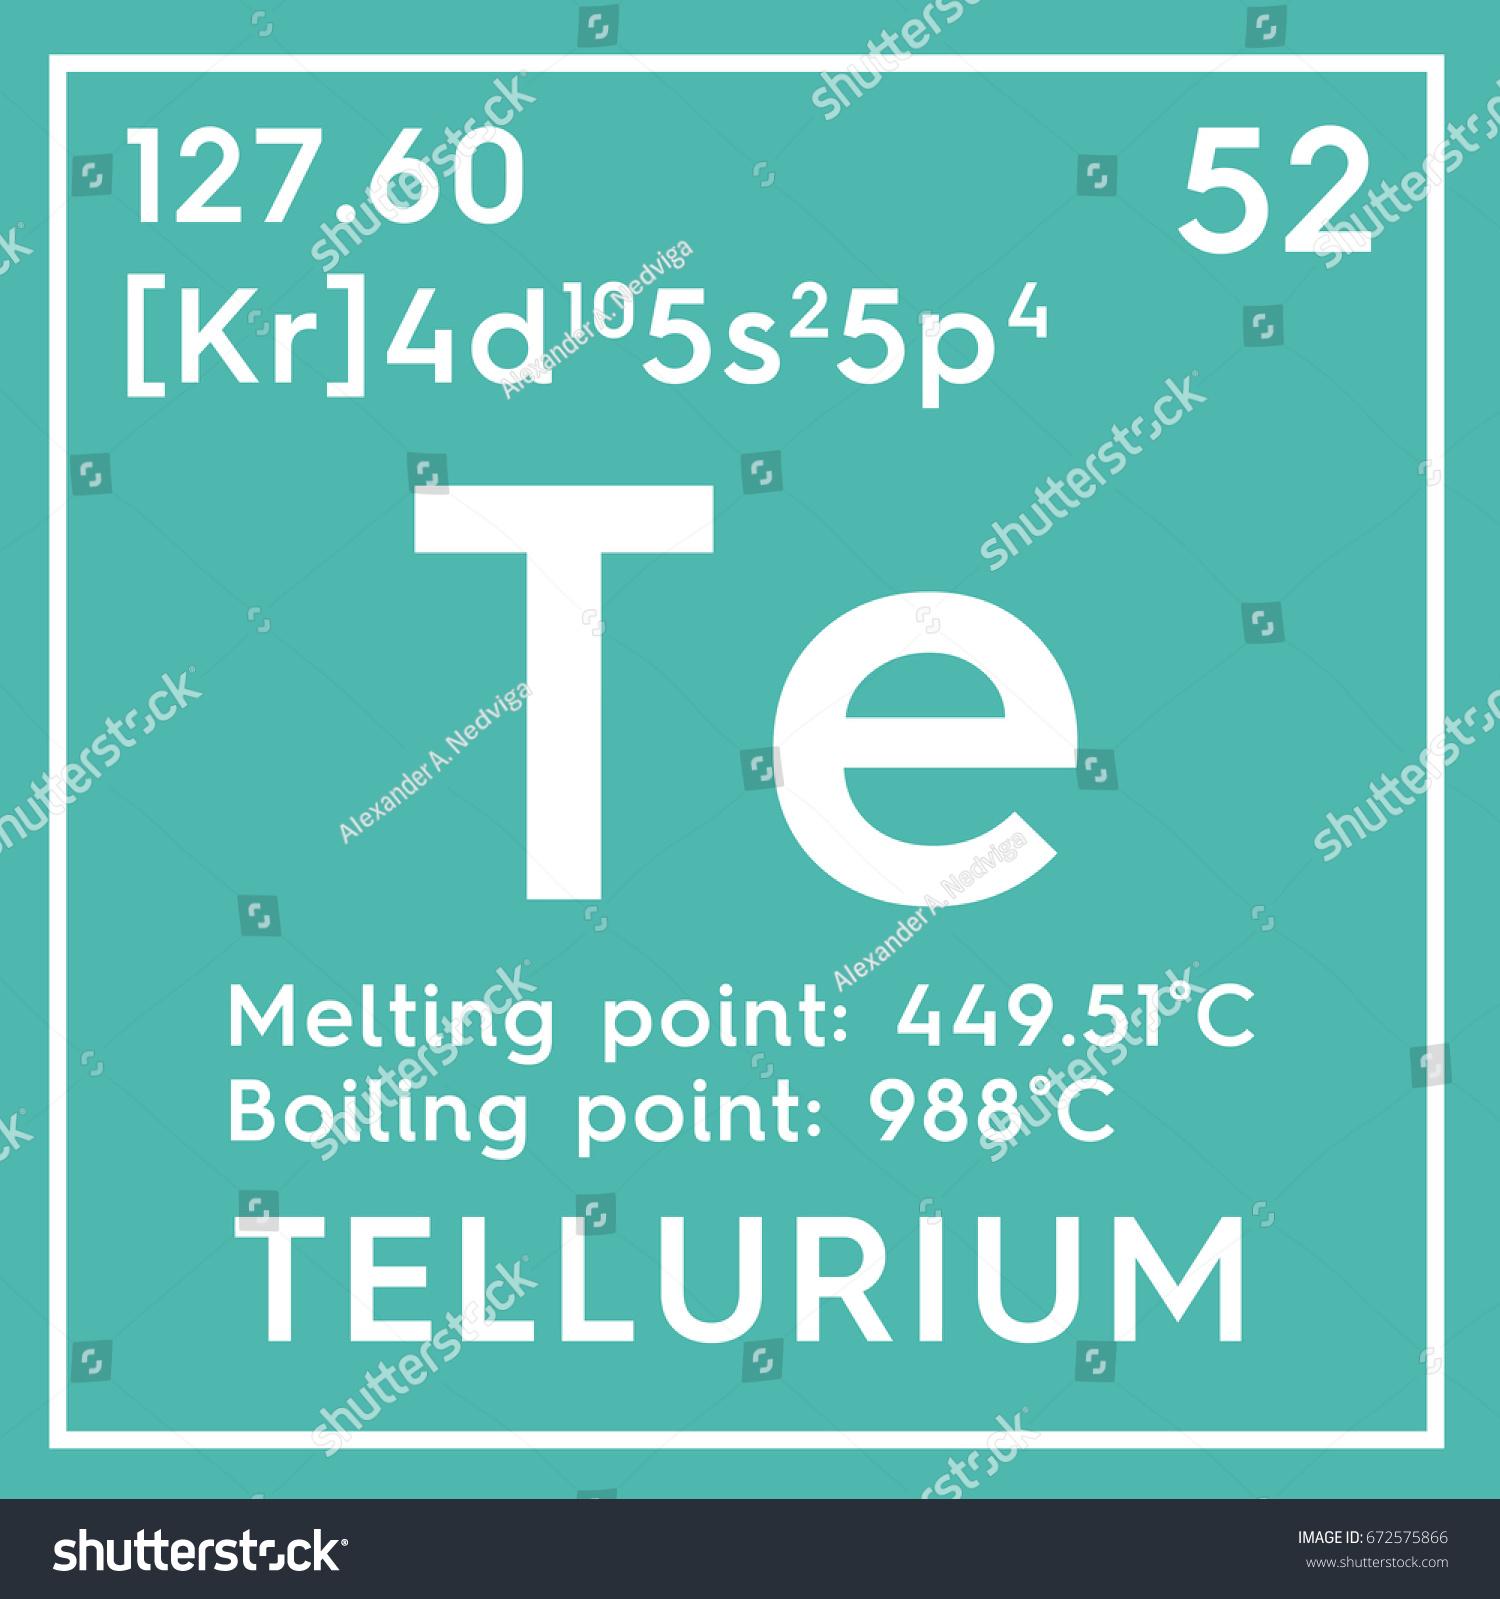 Tantalum Element Slogan Wwwmiifotoscom